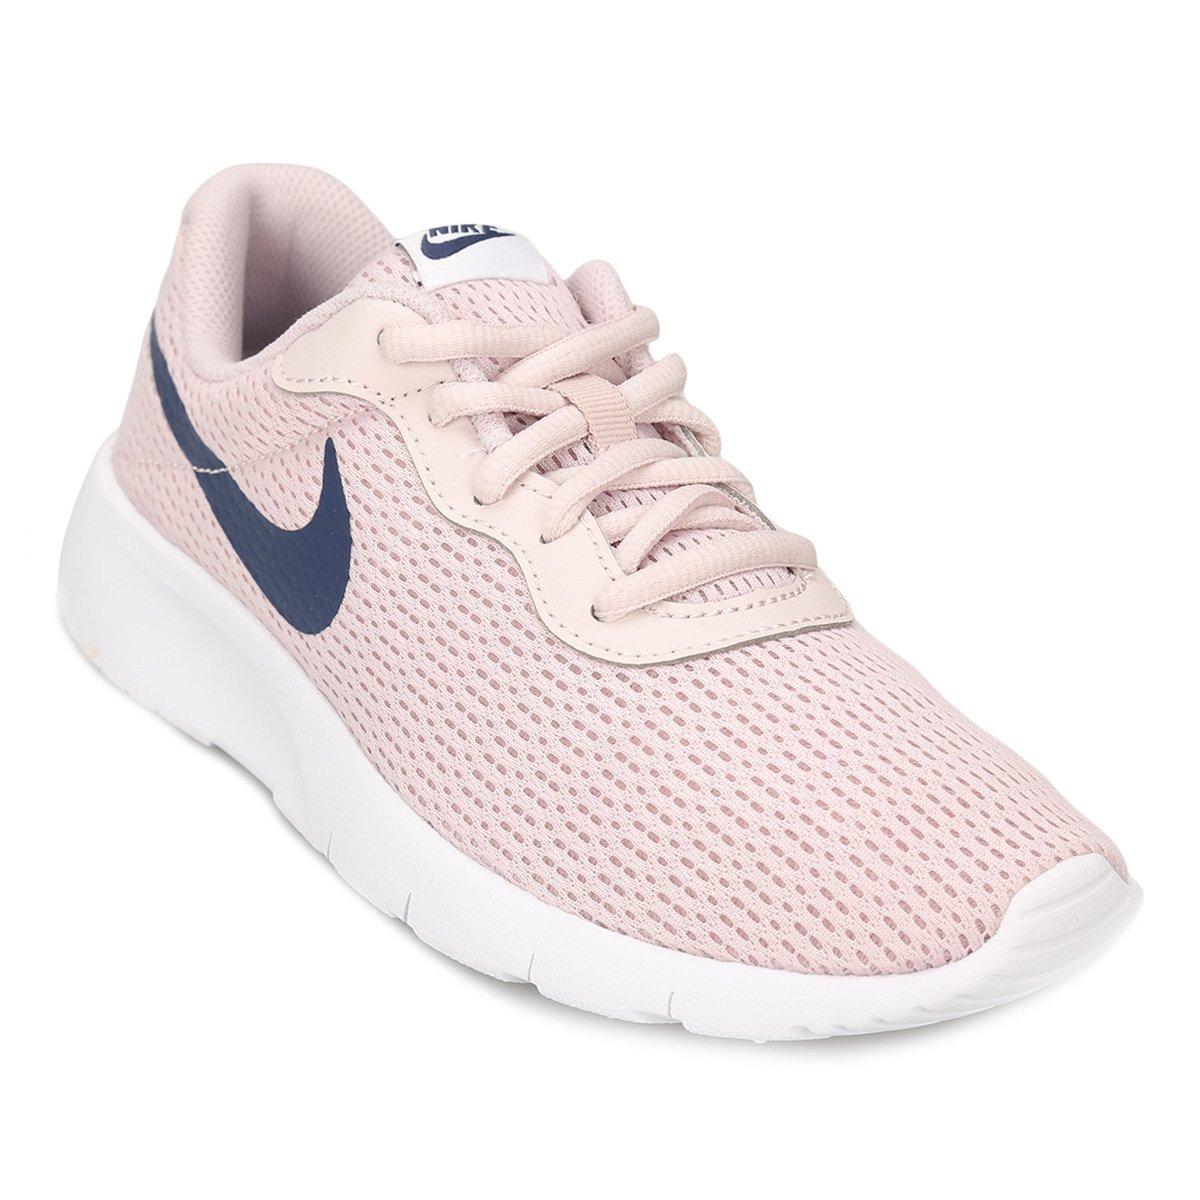 a5652f3b Zapatillas Nike Tanjun Gs Infantil - Originales - $ 3.978,28 en ...